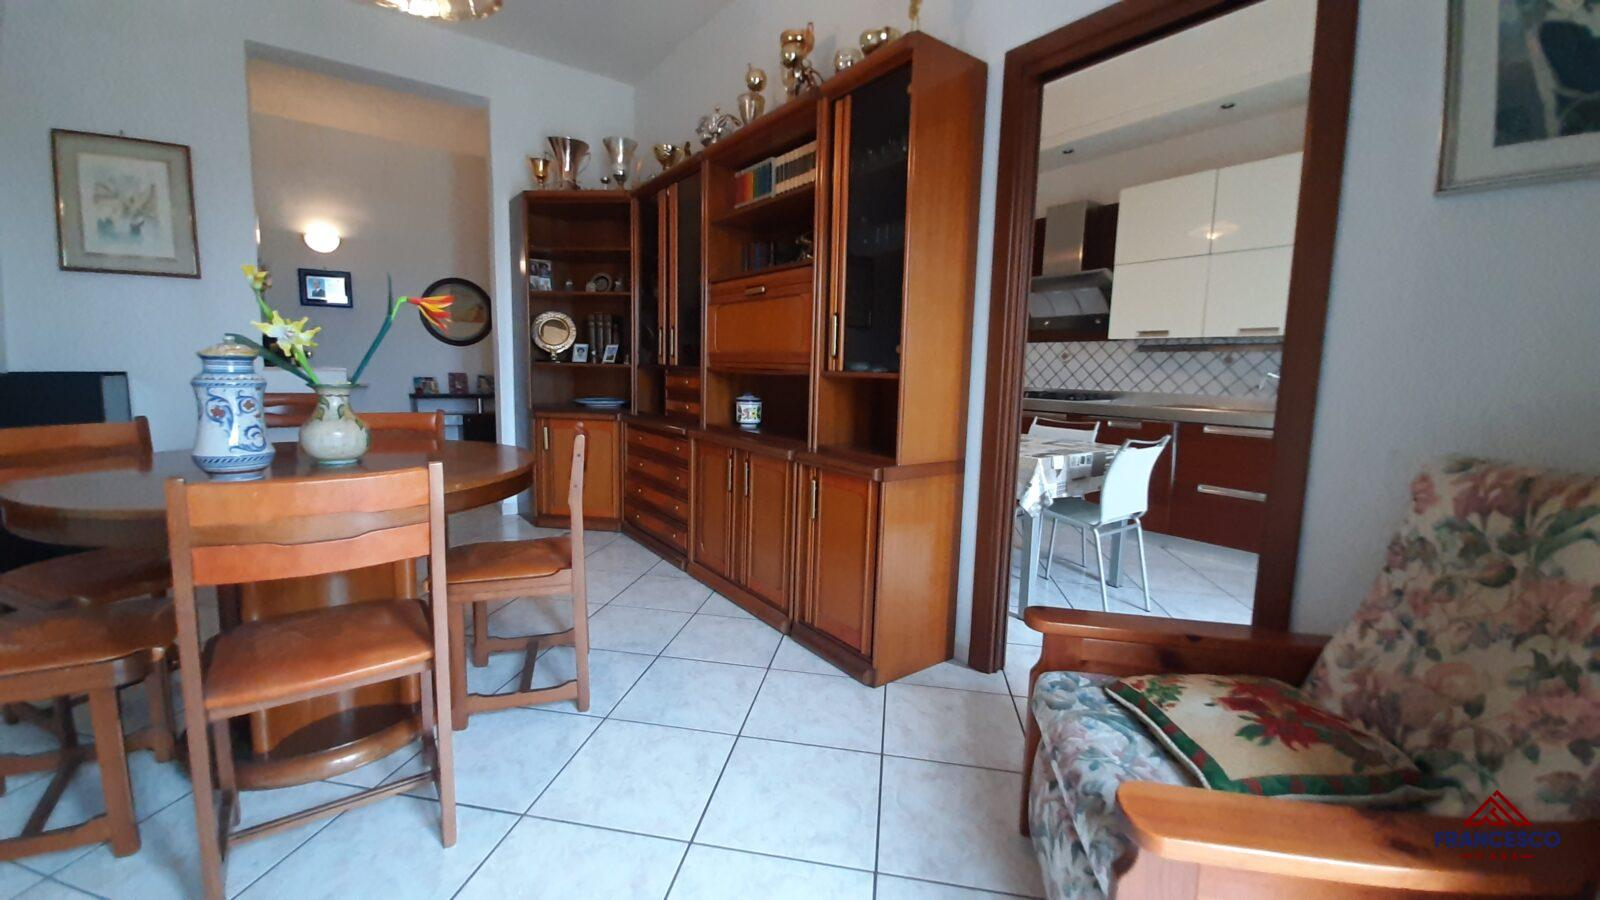 Appartamento in vendita ad Angri via Perris